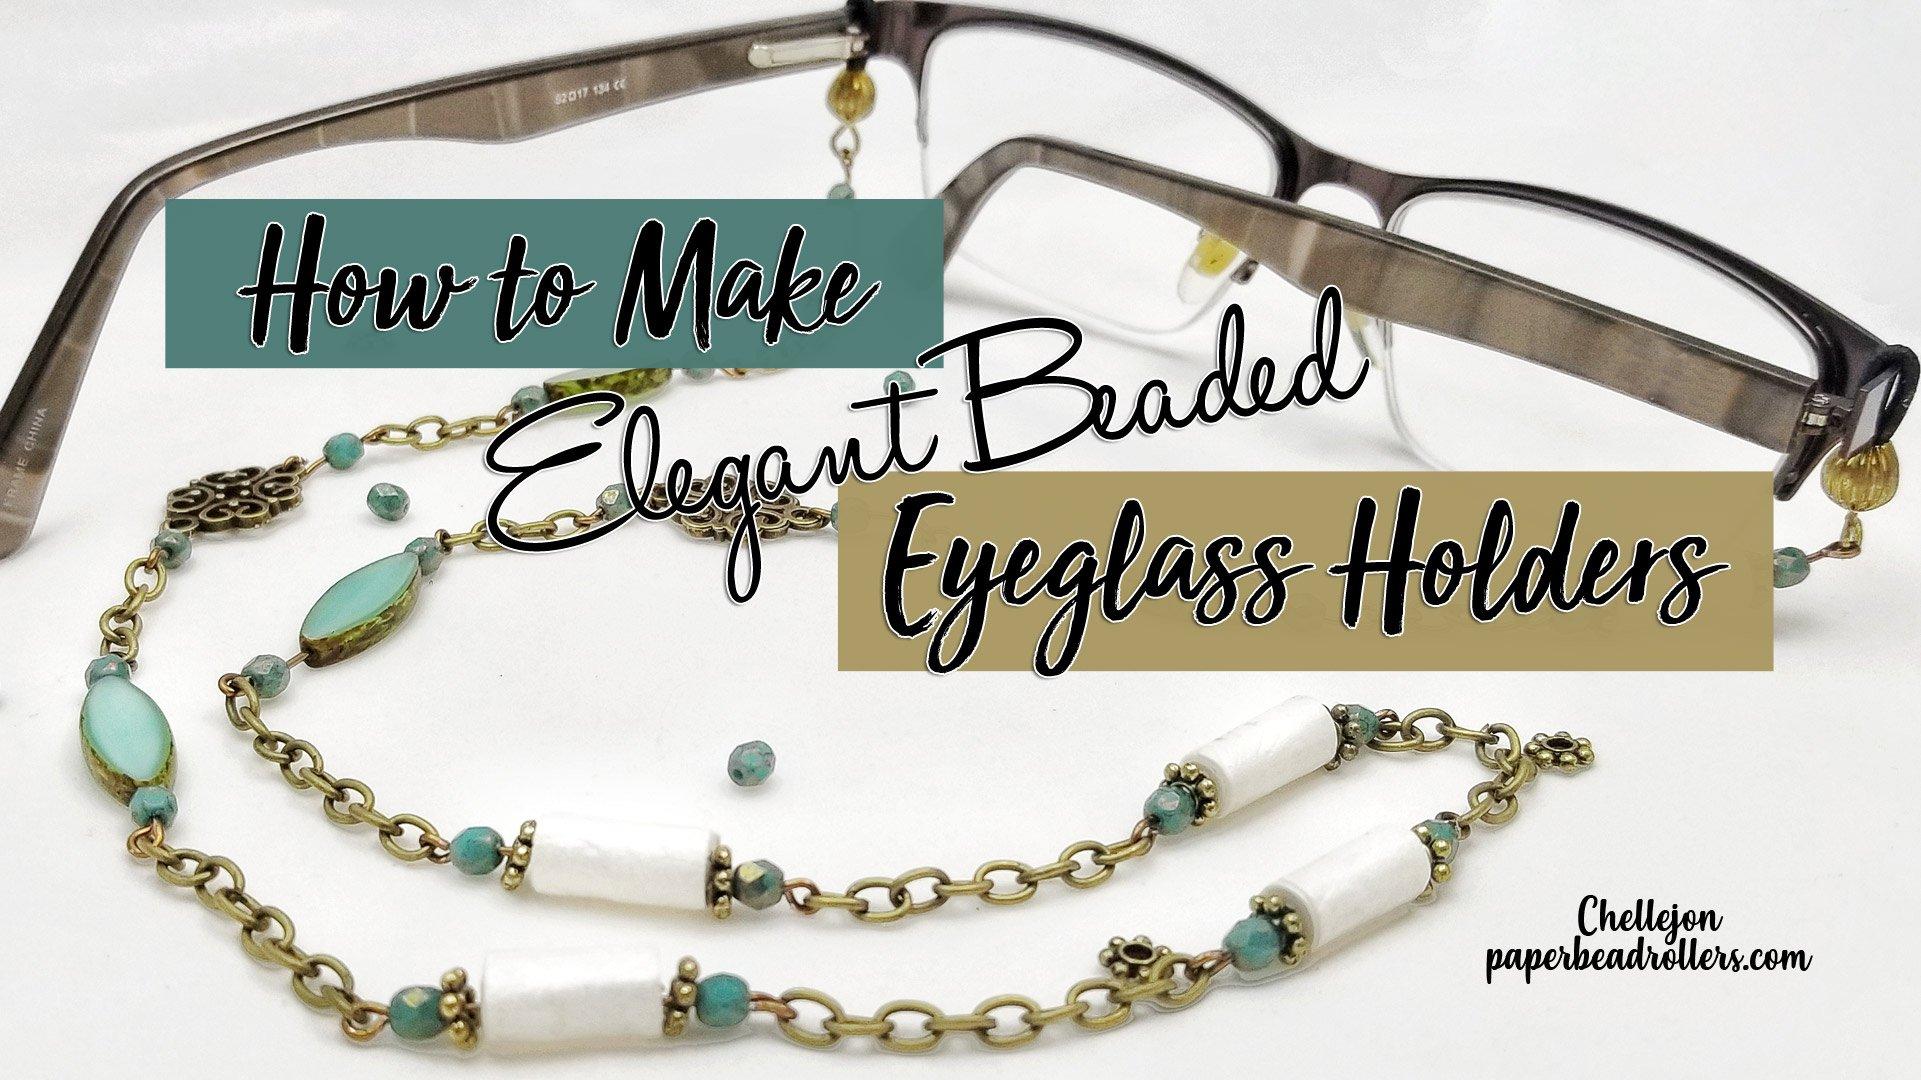 How to Make Beaded Eyeglass Holders